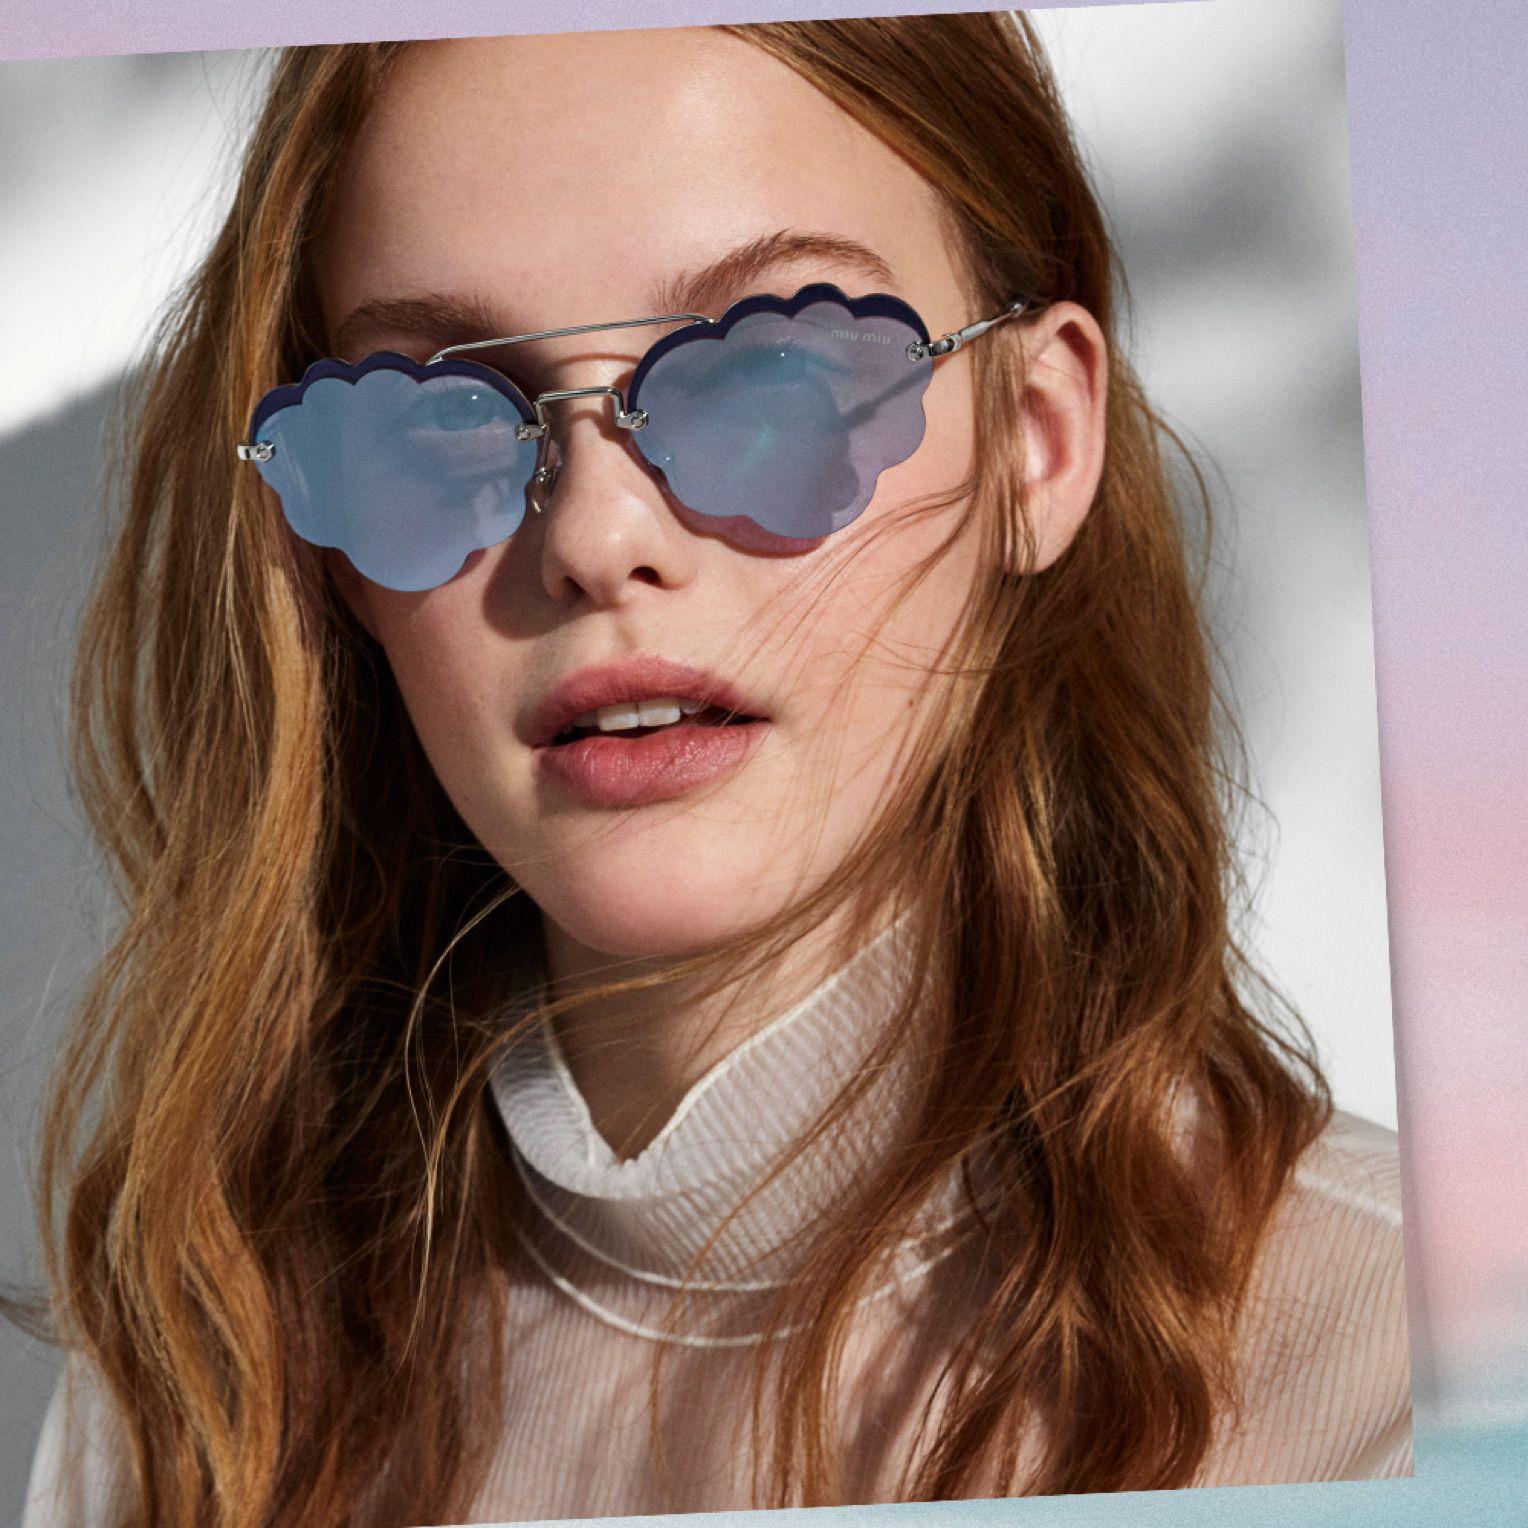 ba49504e046f Trending Sunglasses for Women - Logomania | Sunglass Hut US